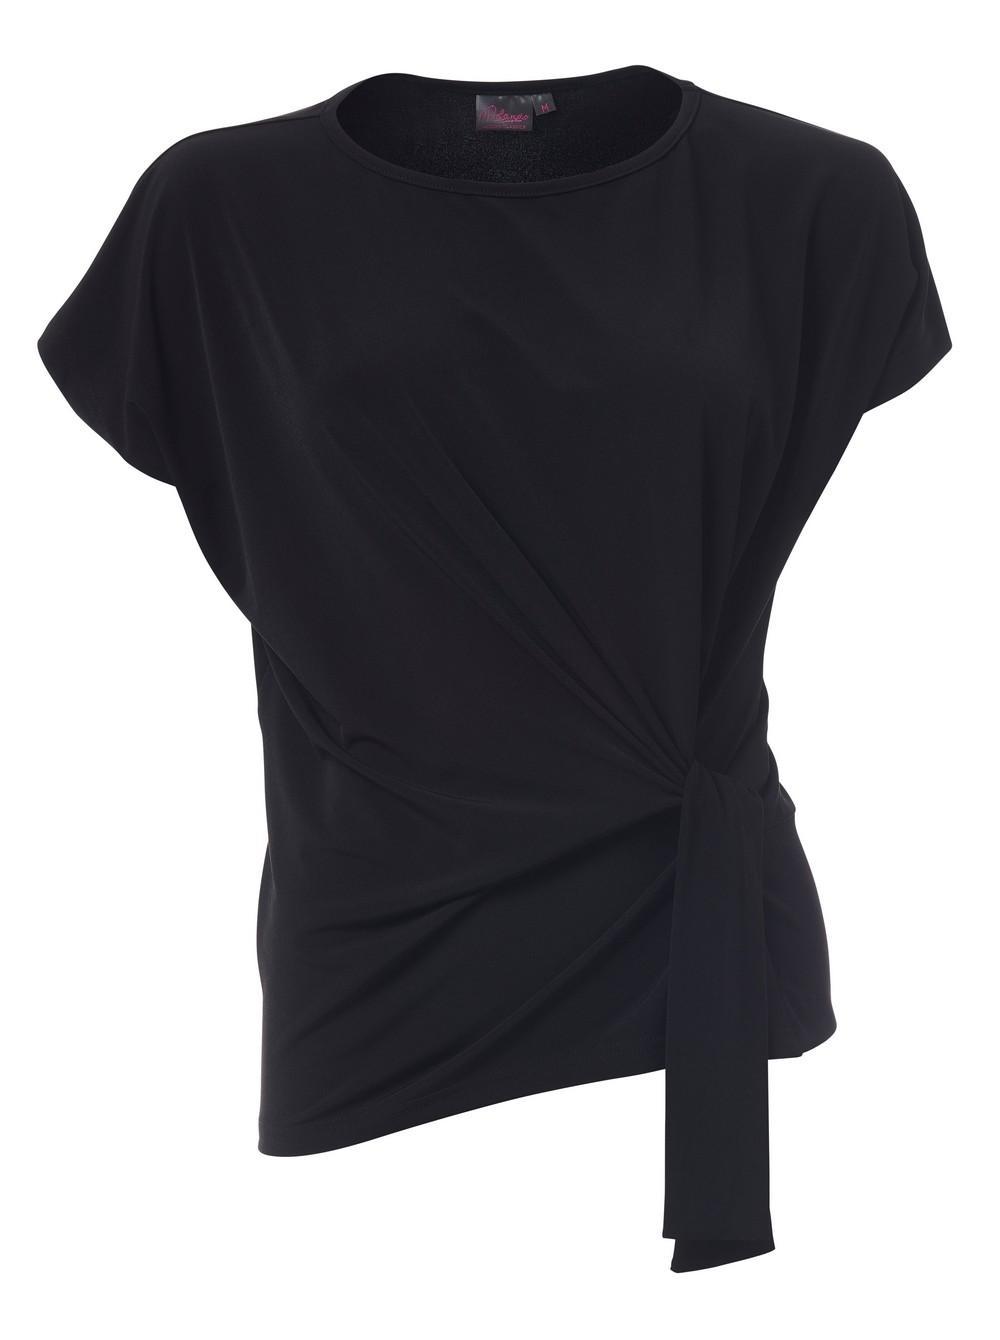 Ines K232 S/s Blouse - Black